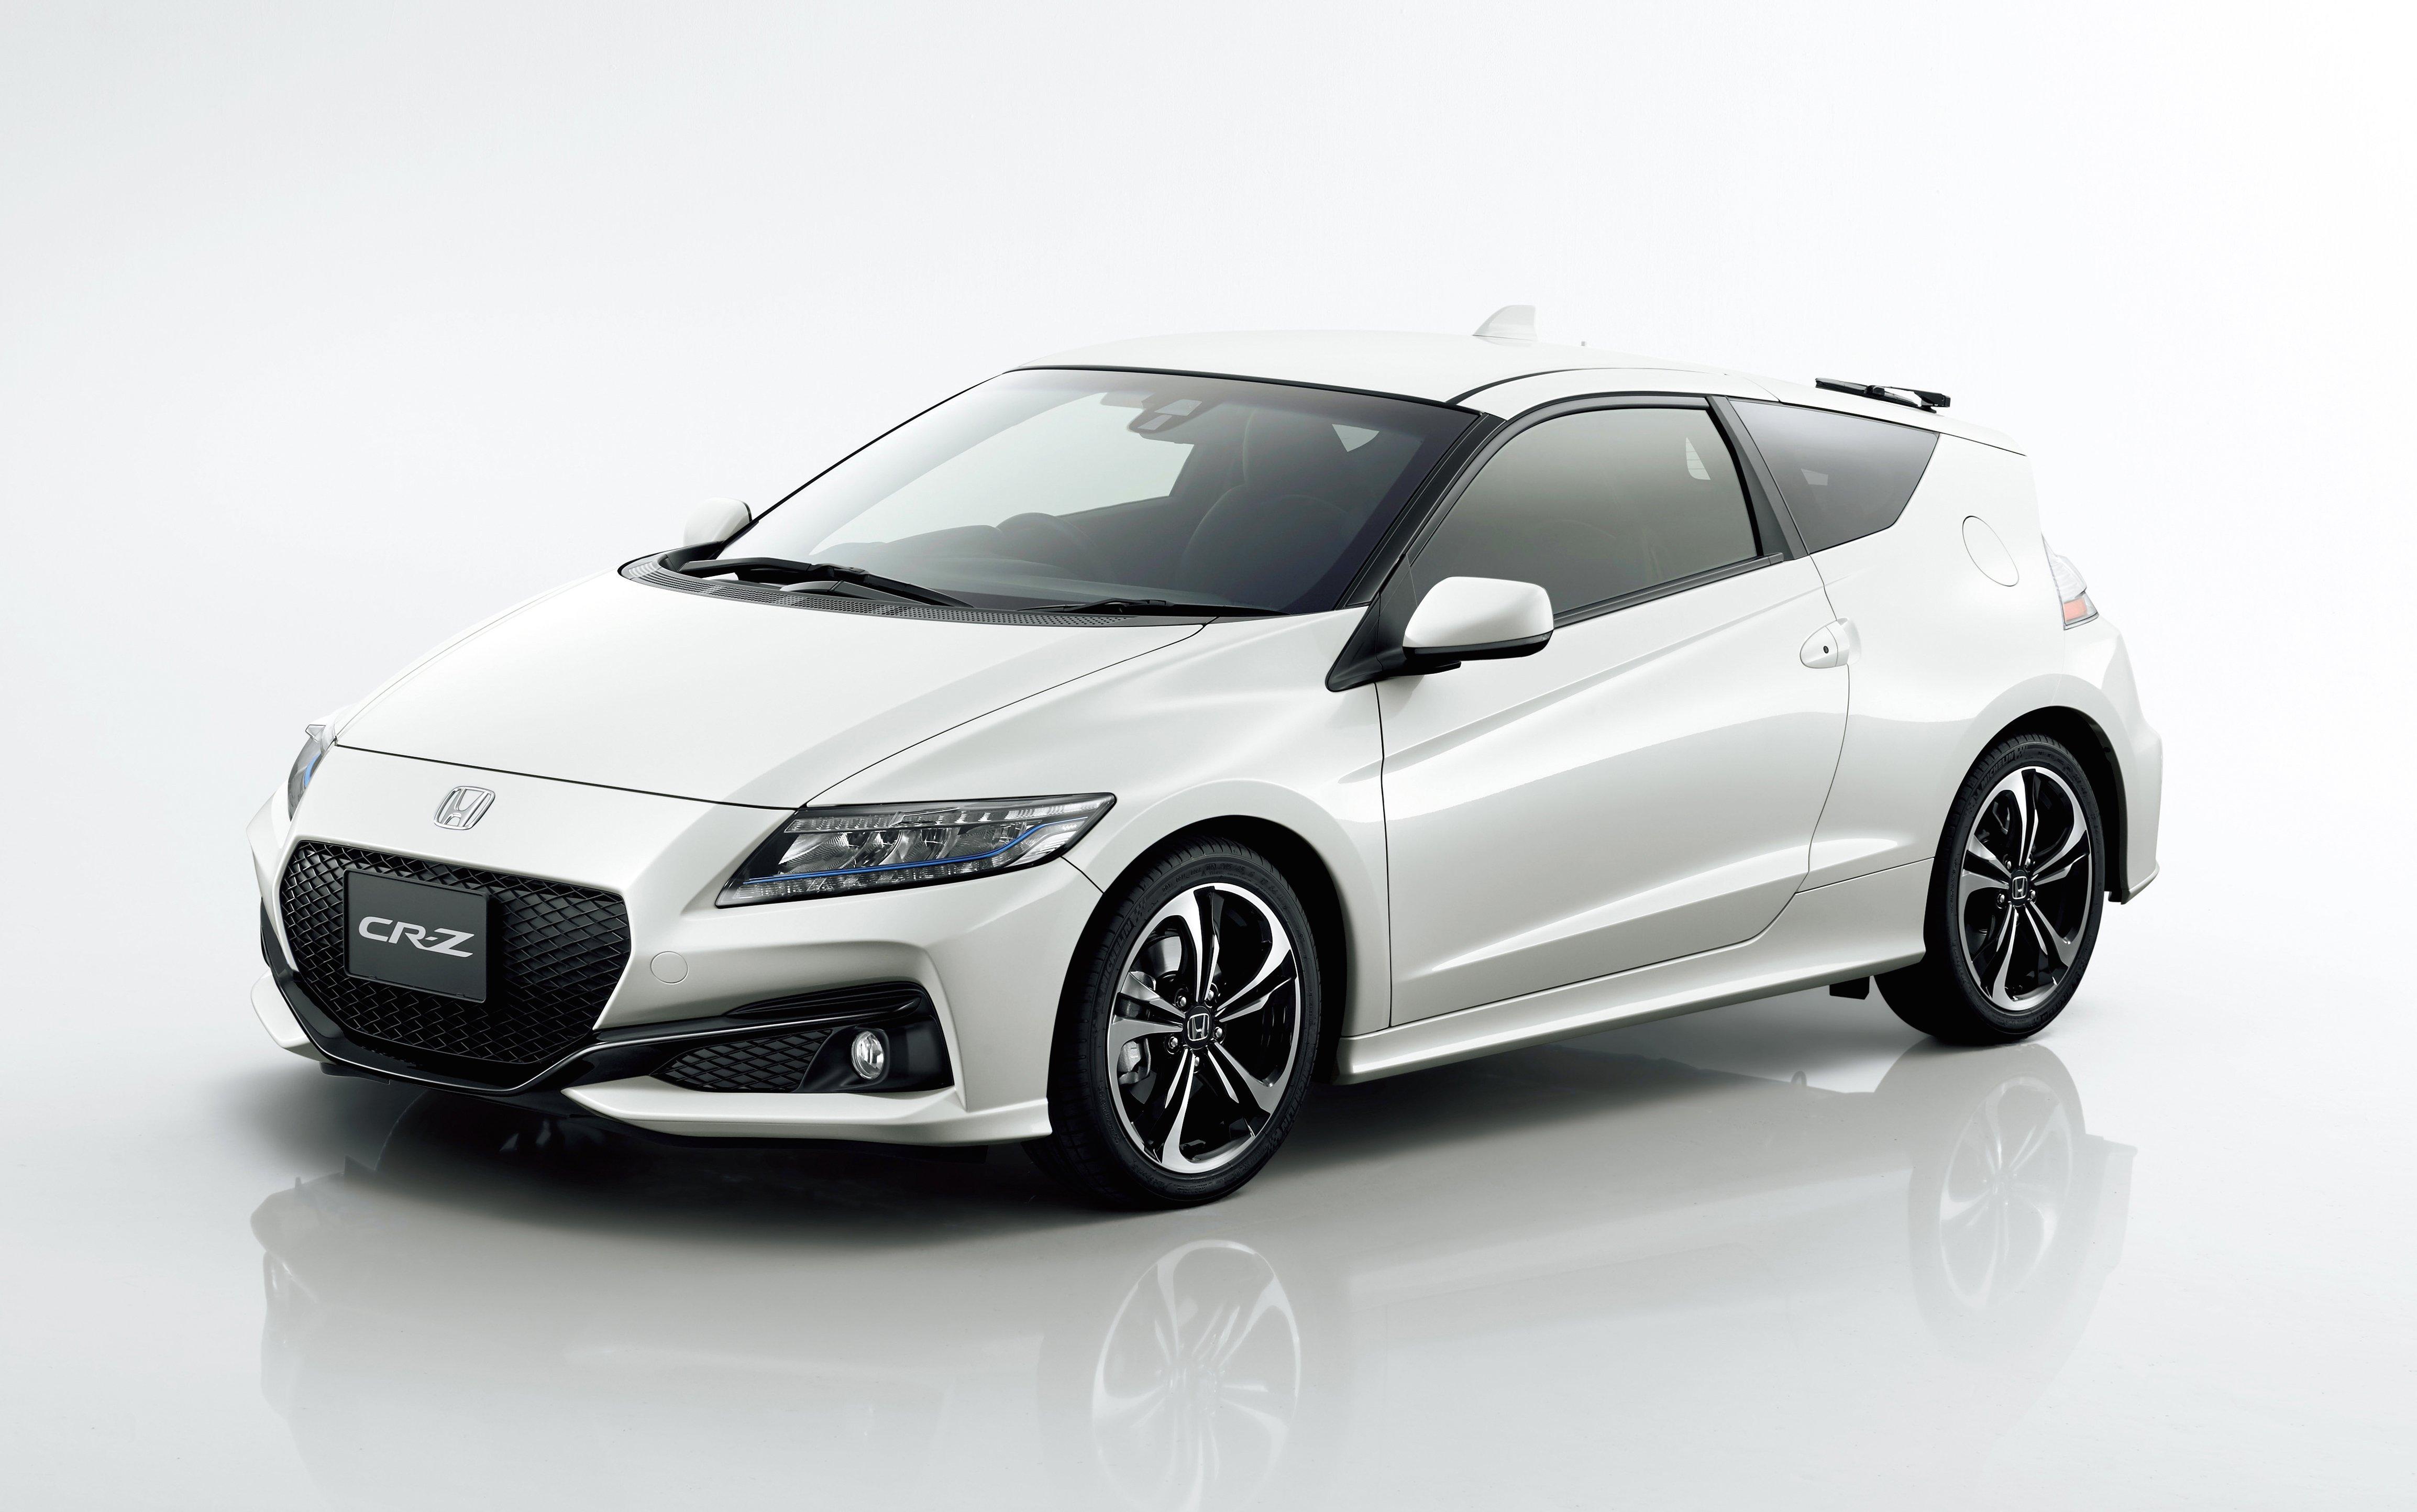 GALLERY: 2015 Honda CR-Z facelift in detail Paul Tan ...